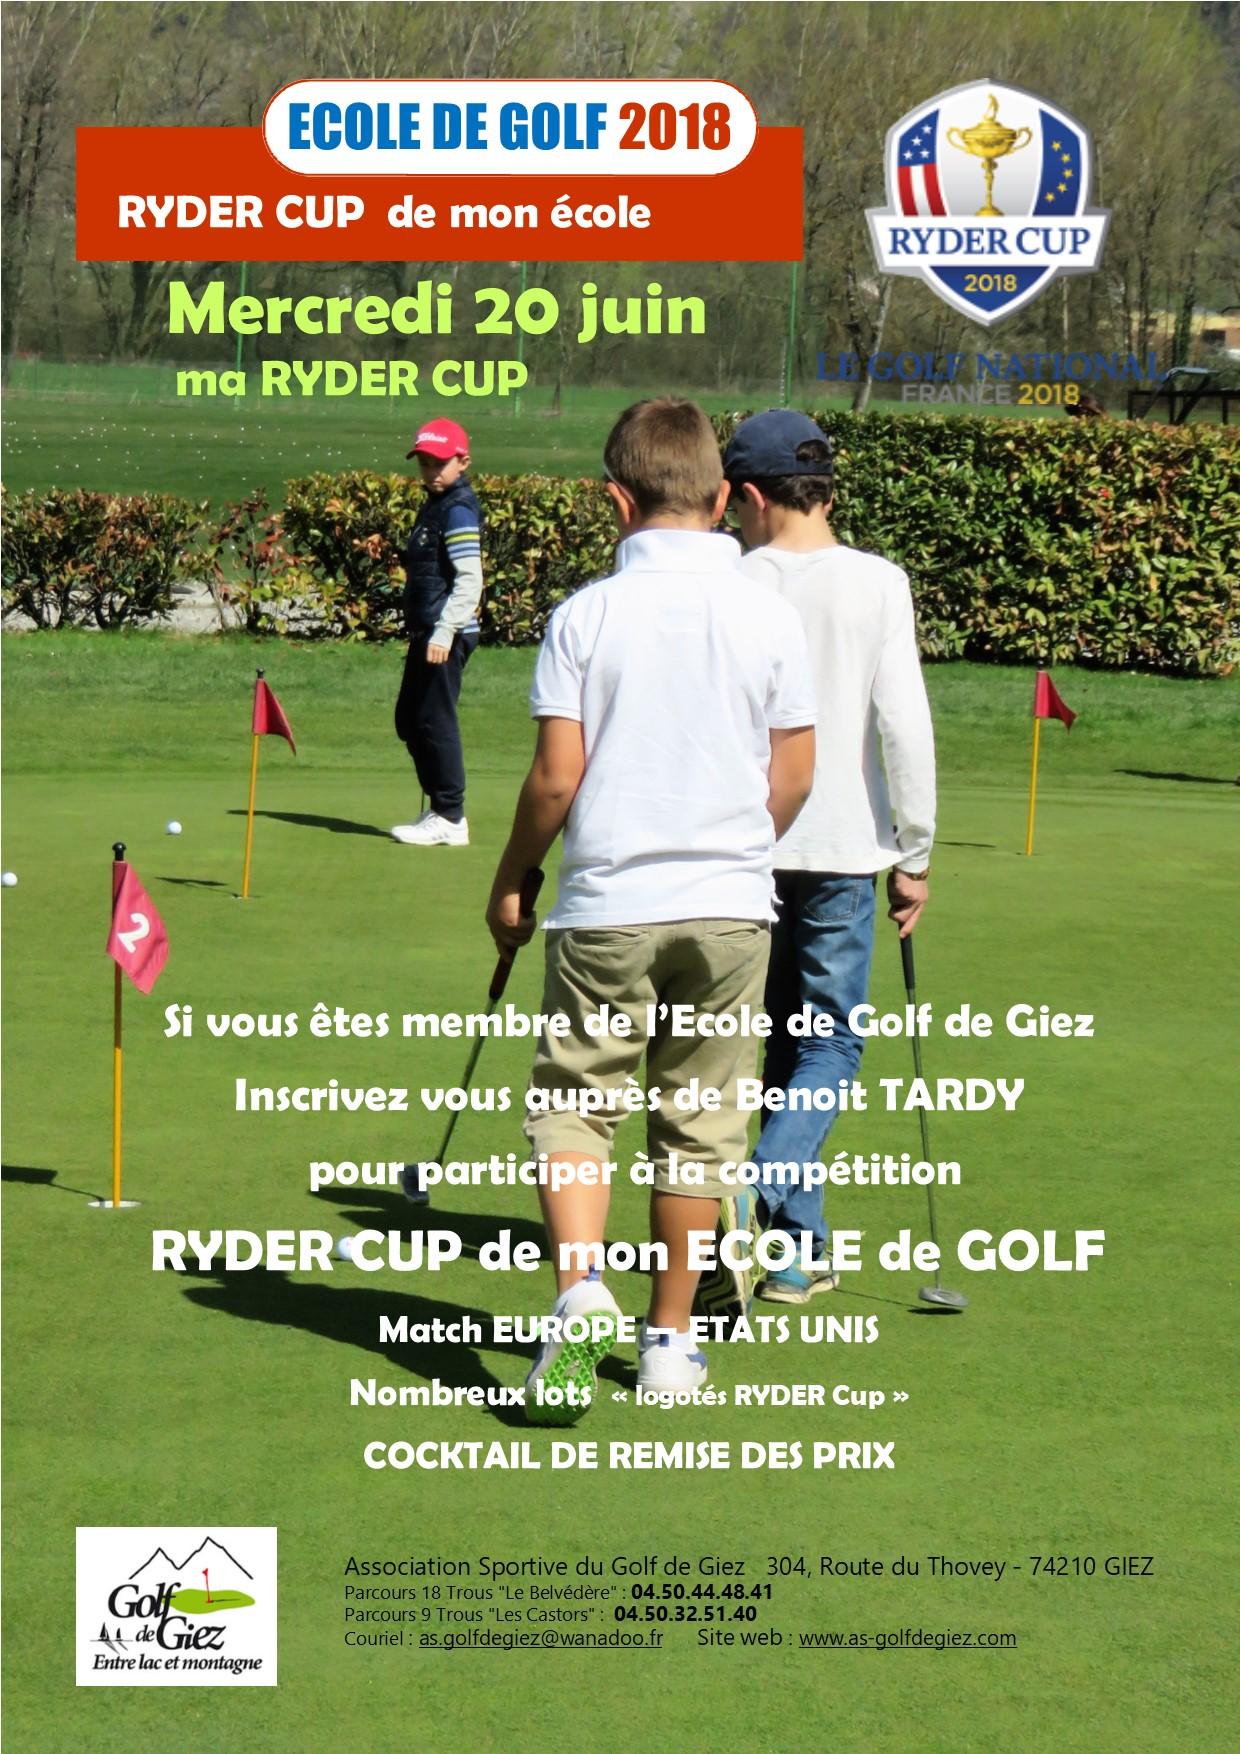 Ryder cup ecole de golf de giez 2018